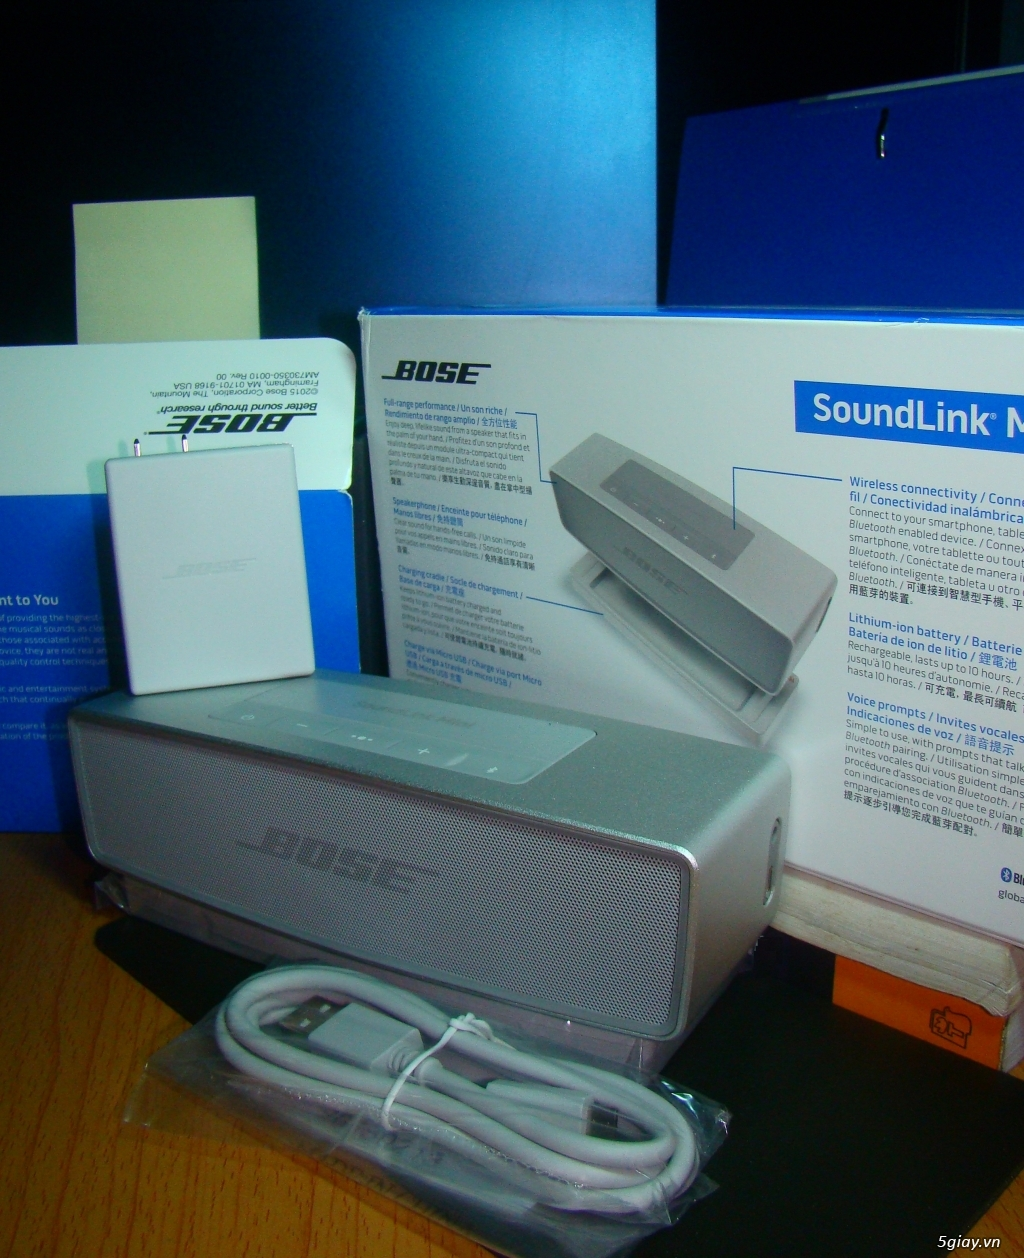 Bán loa Bluetooth Bose Soundlink Mini2 giá tốt - 1